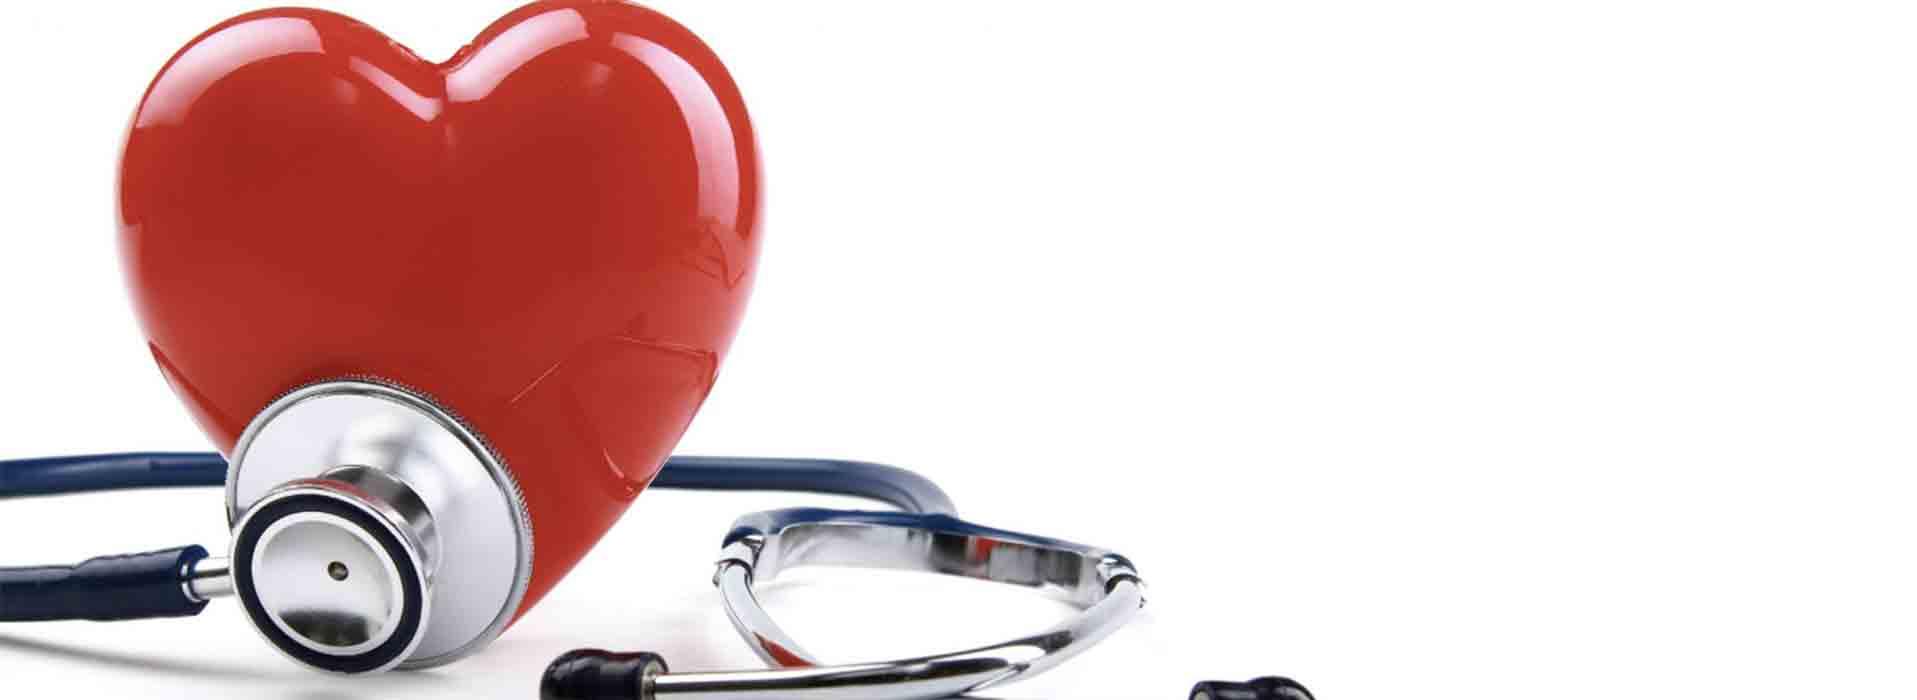 Hartinfarct